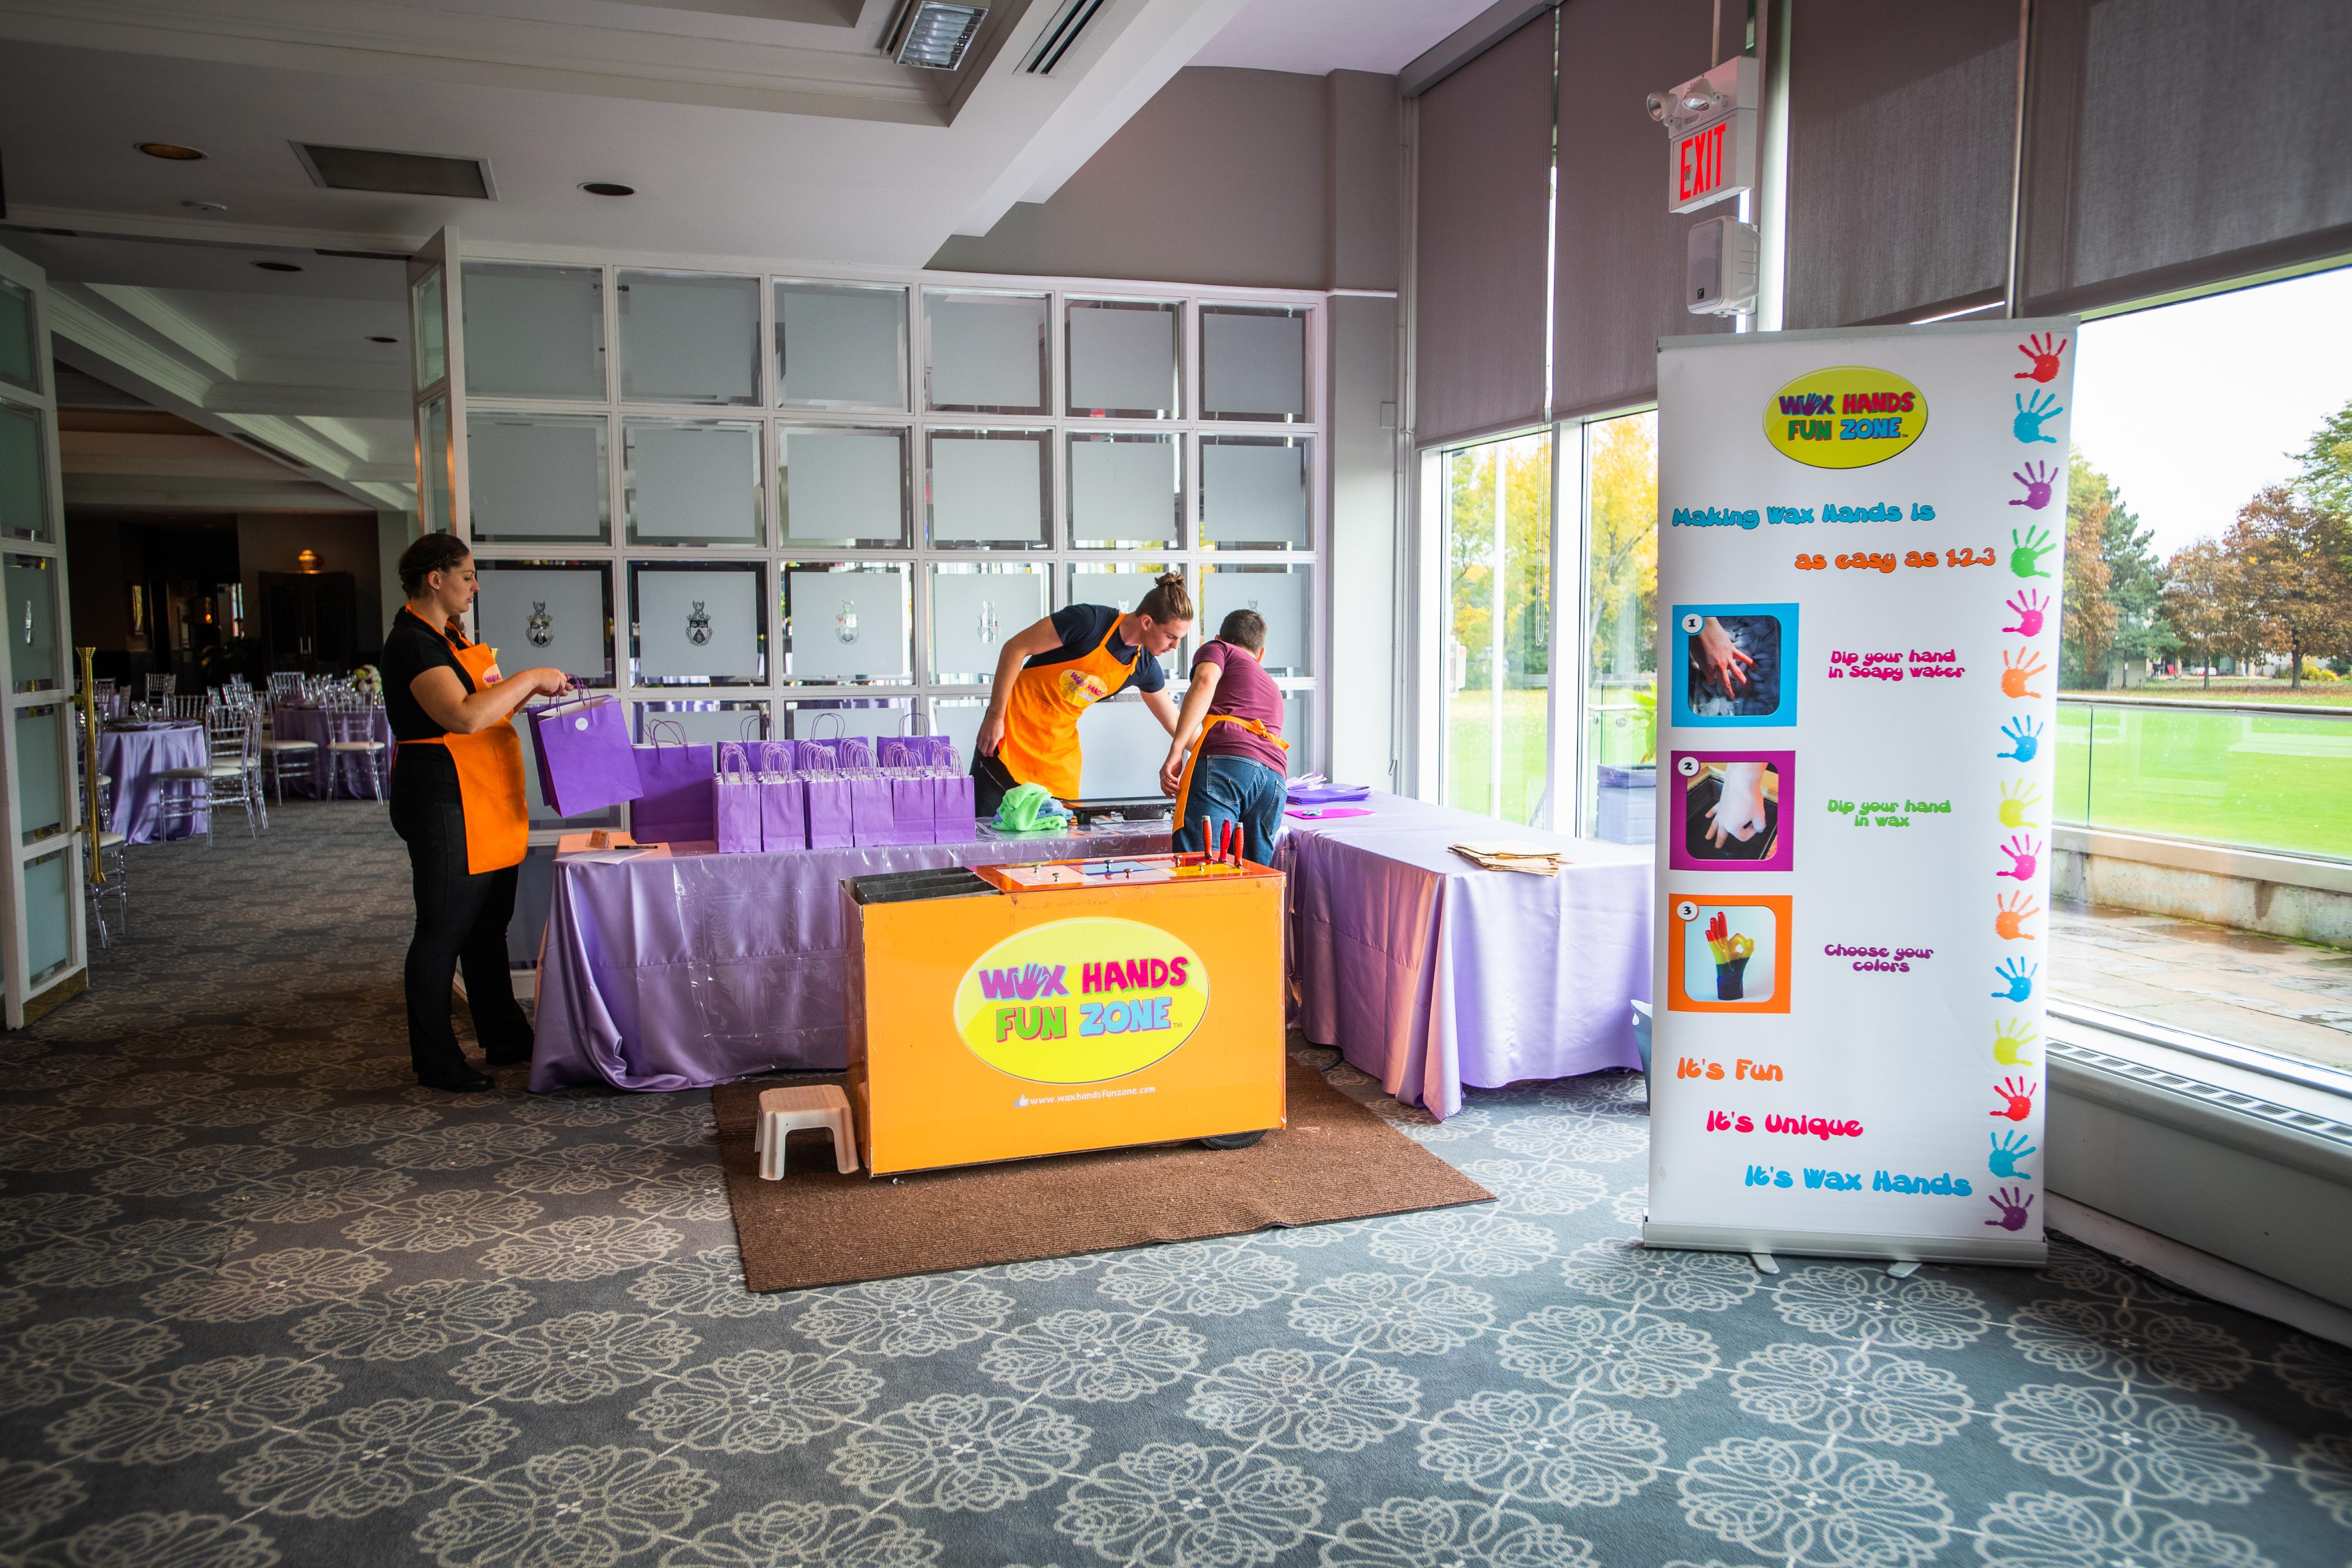 WaxHandFunZone – Bat Mitzvah Event Setup